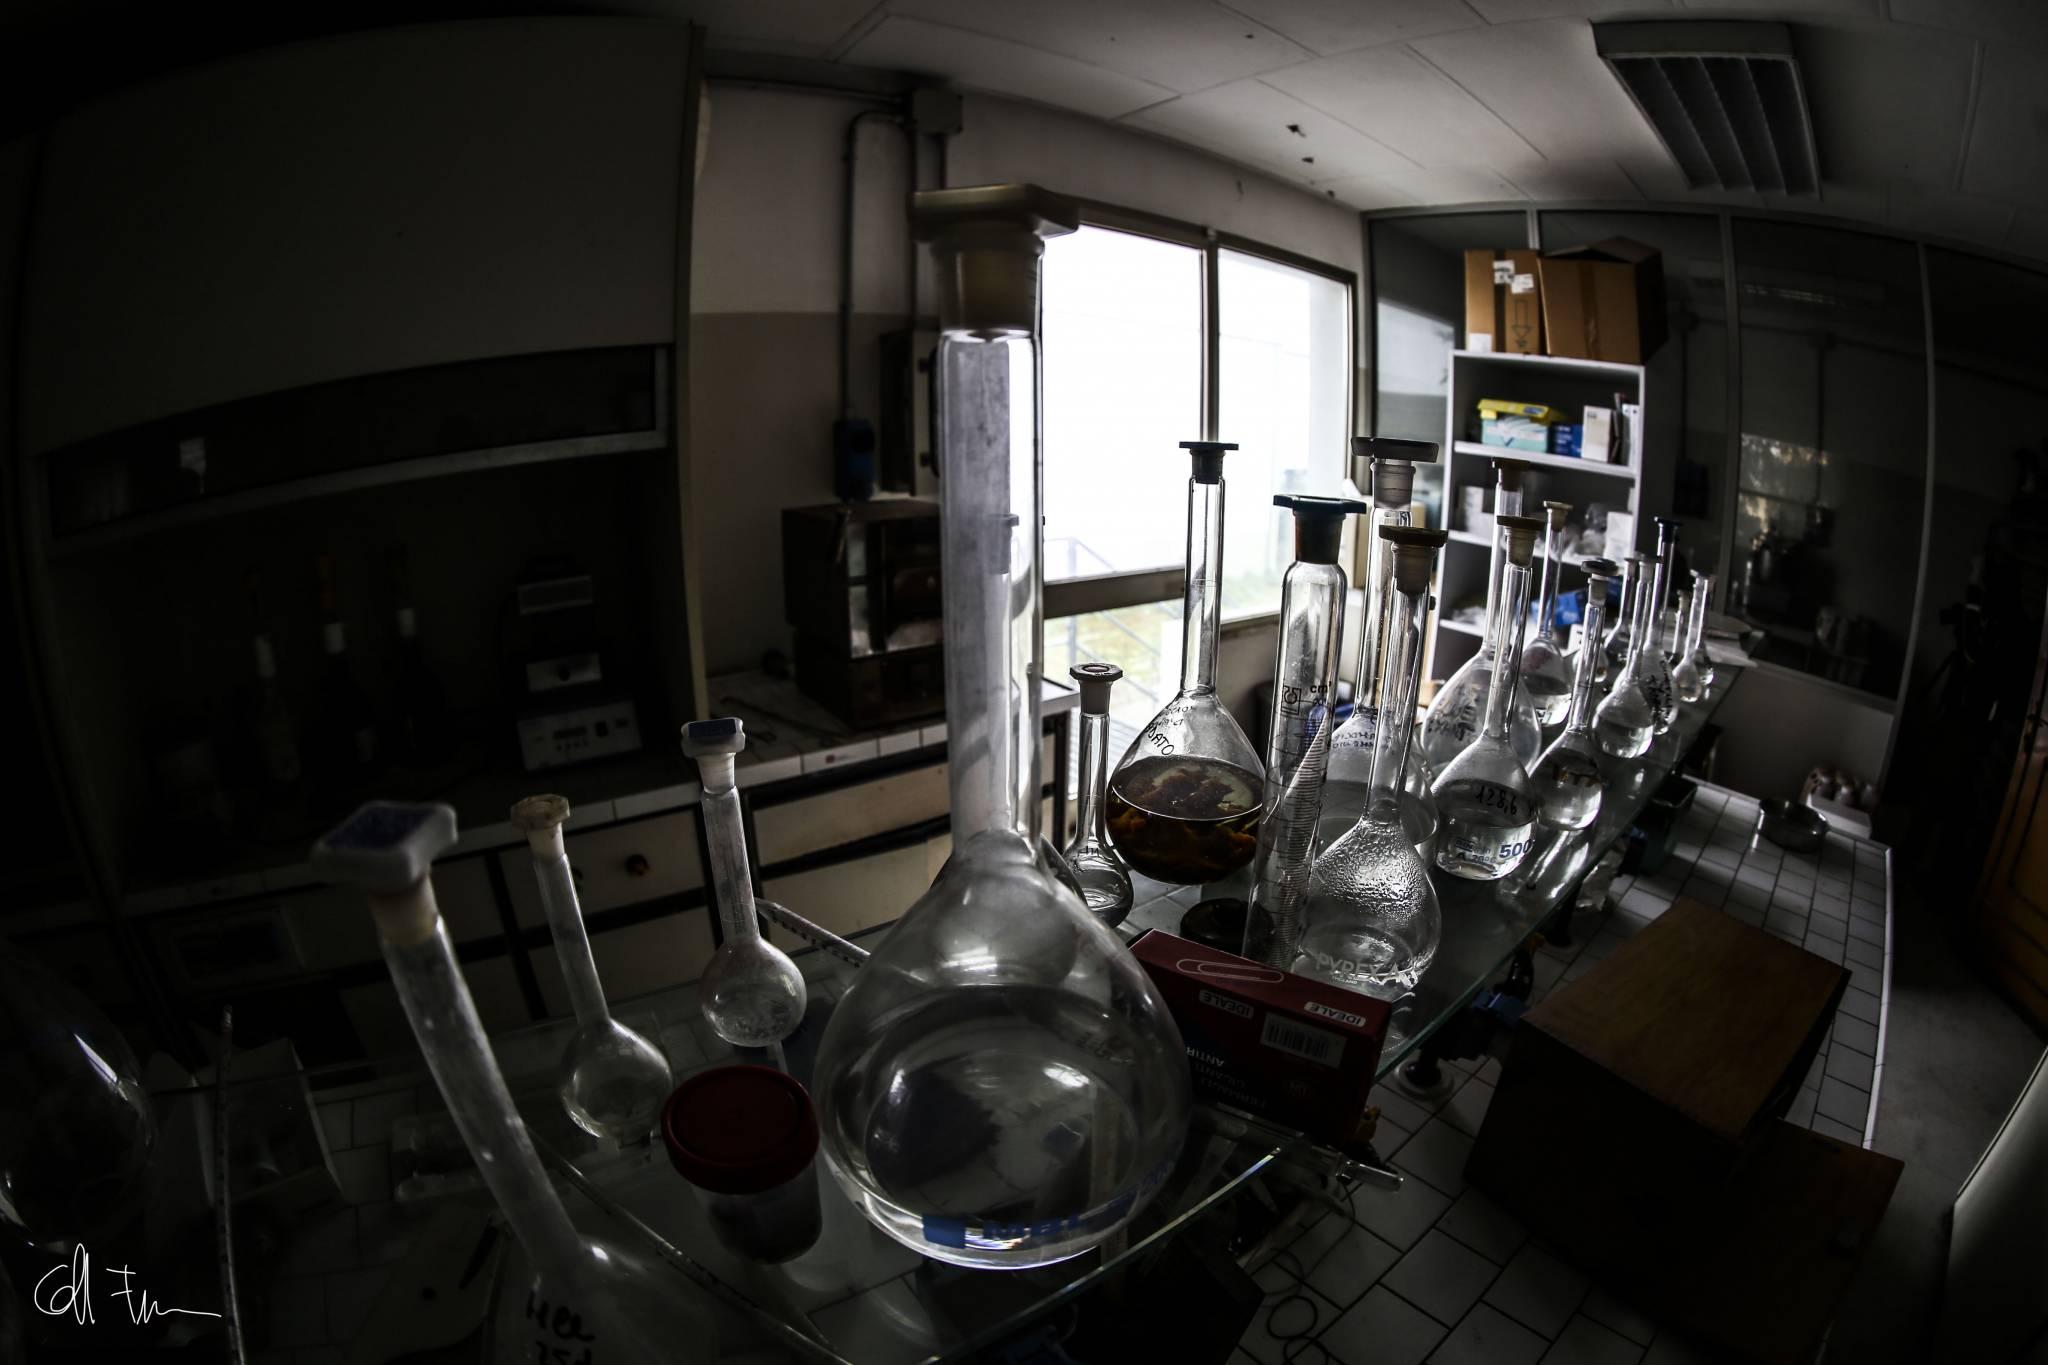 biotecnologie disperse - urbex emilia - urbex italia - urbex italy - abandoned buildings